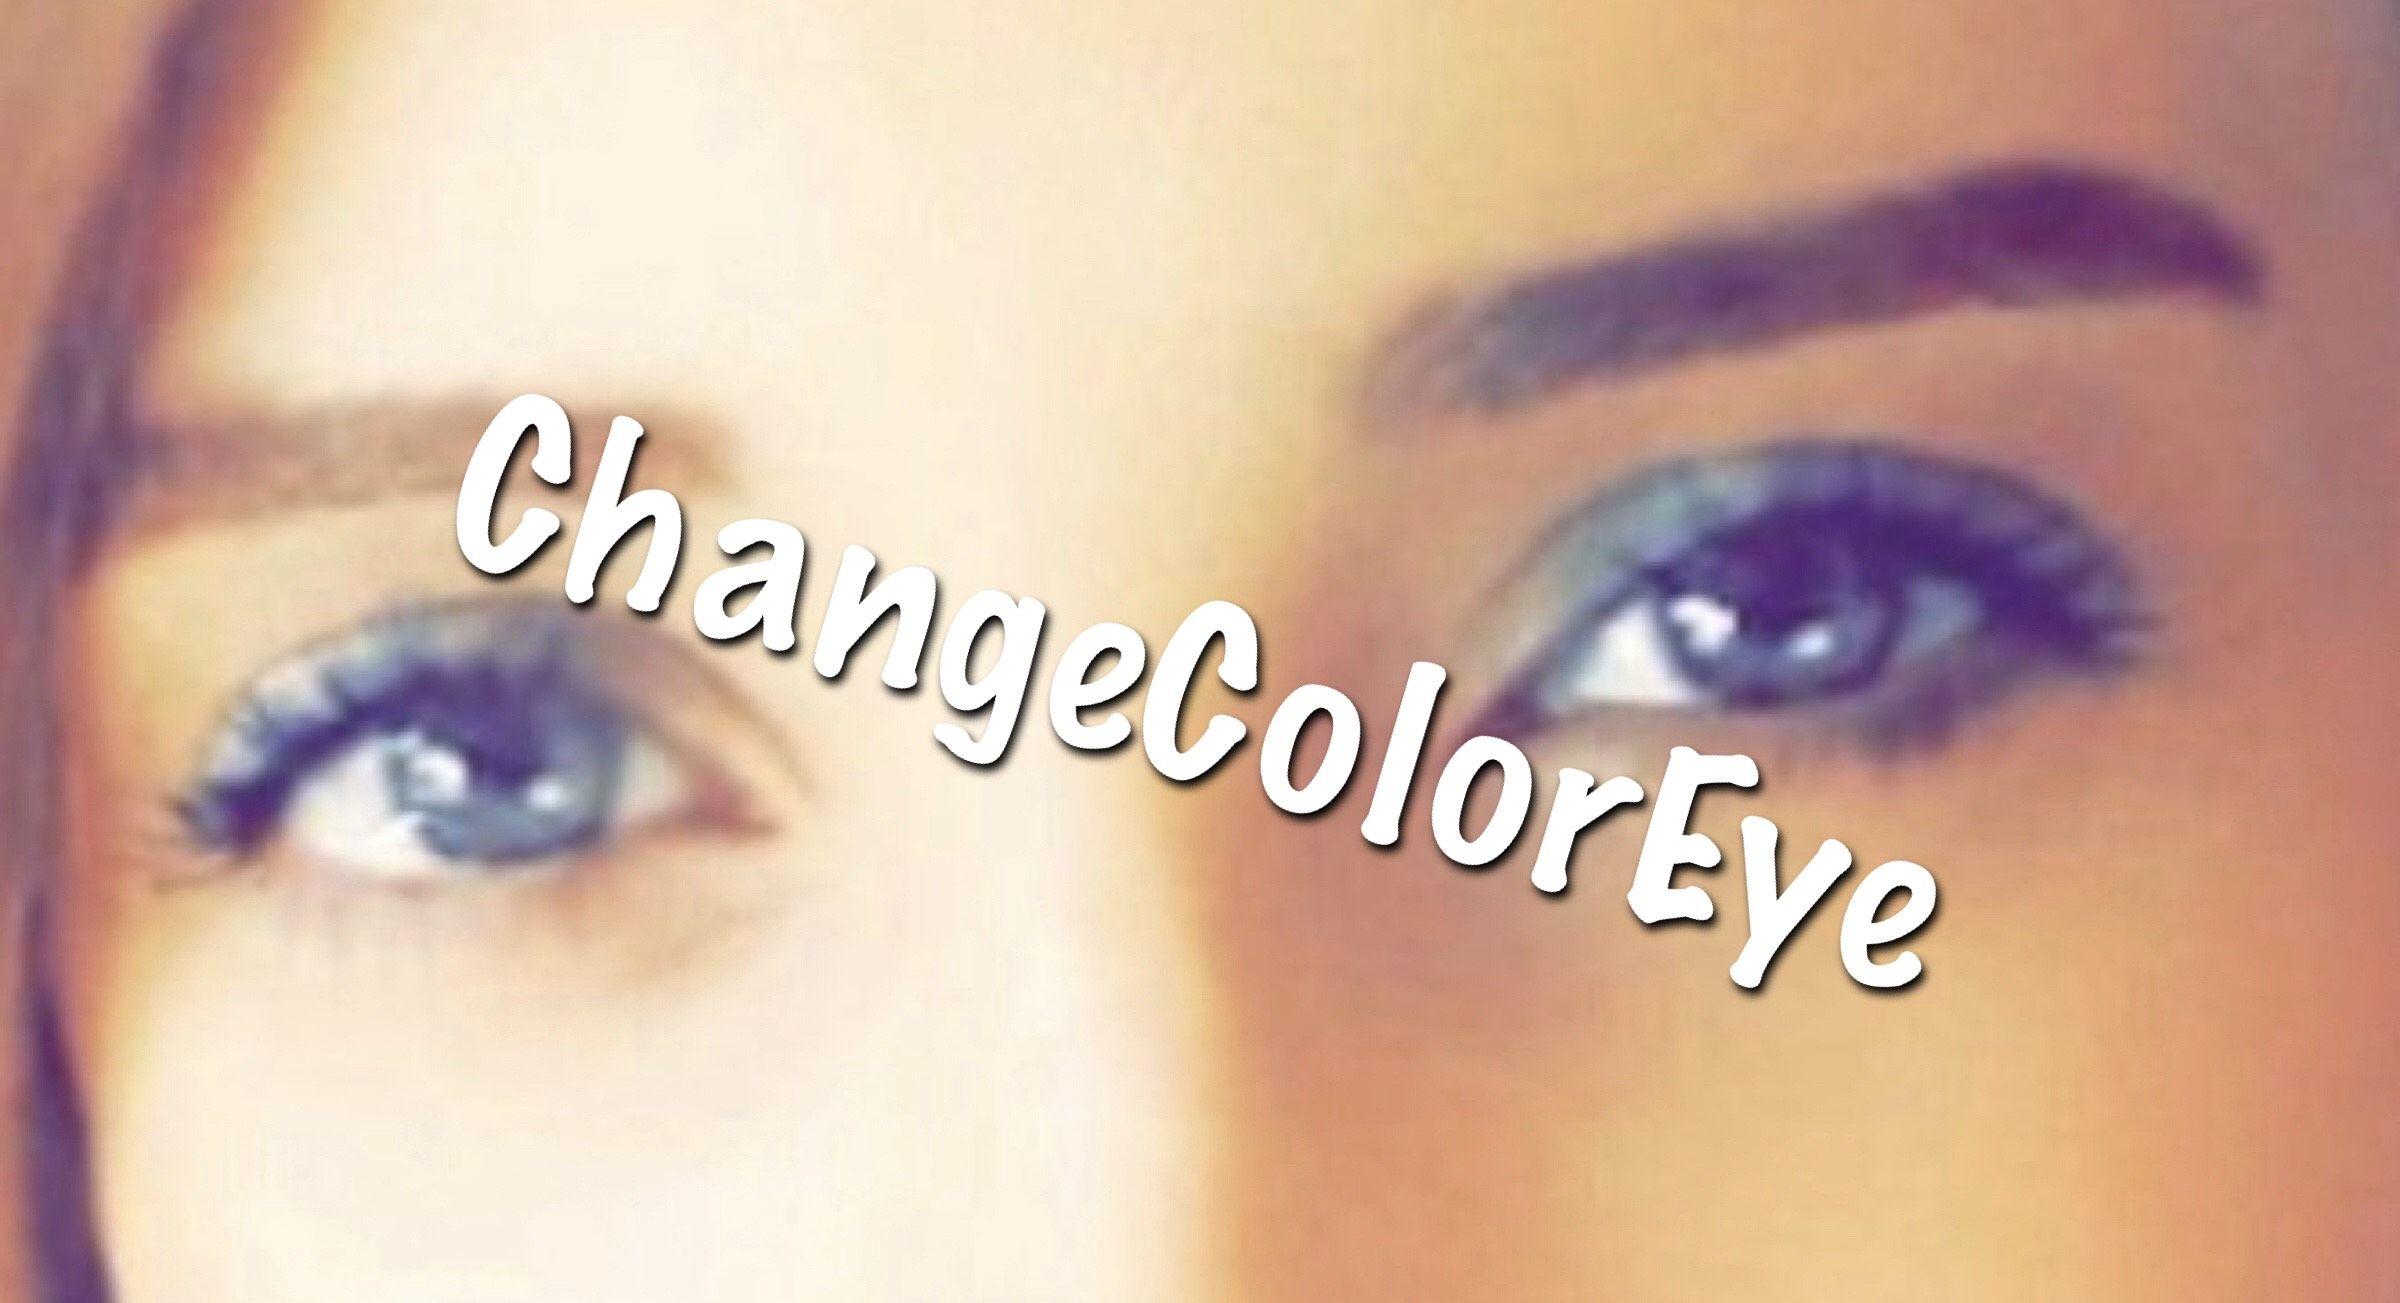 Chromosome 15 Eye Colour Eye Color Change Eye Color Rare Eye Colors